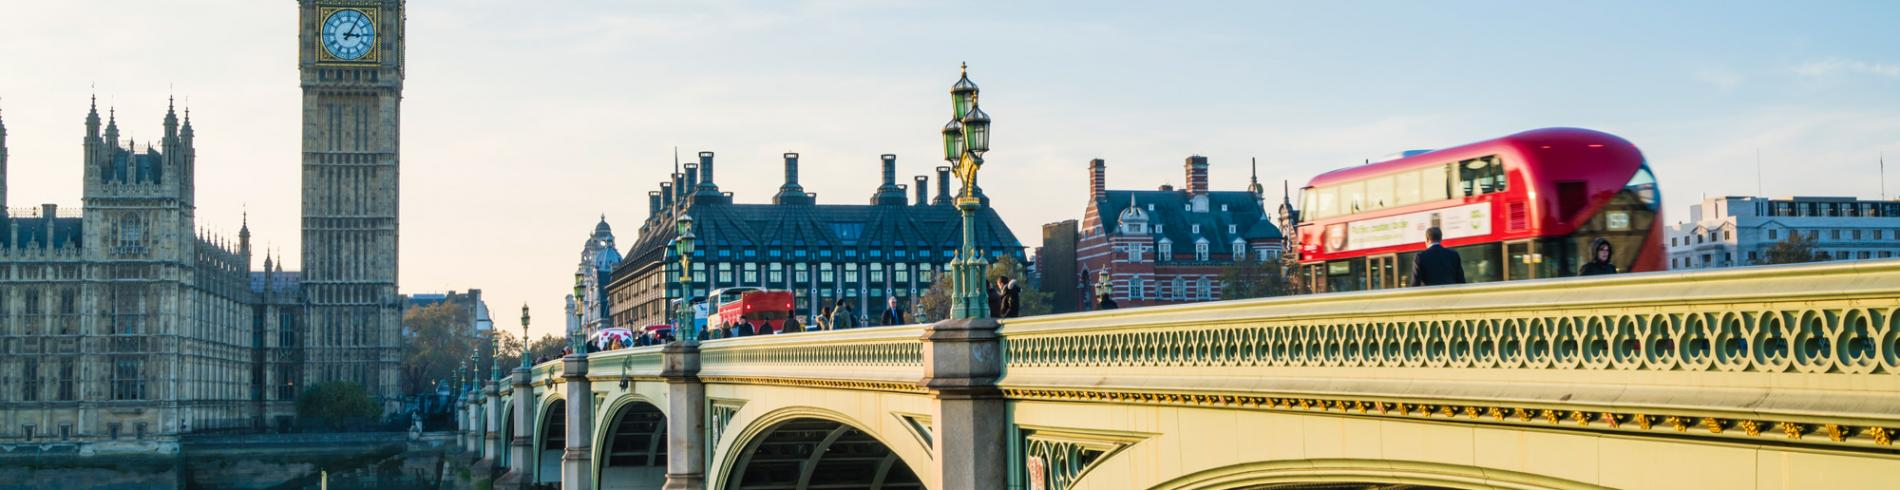 Big Ben and the Thames River